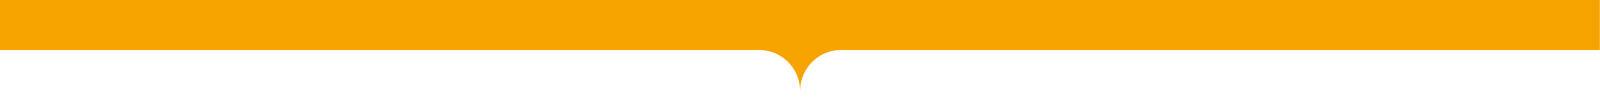 inkeping_oranje_wit.jpg